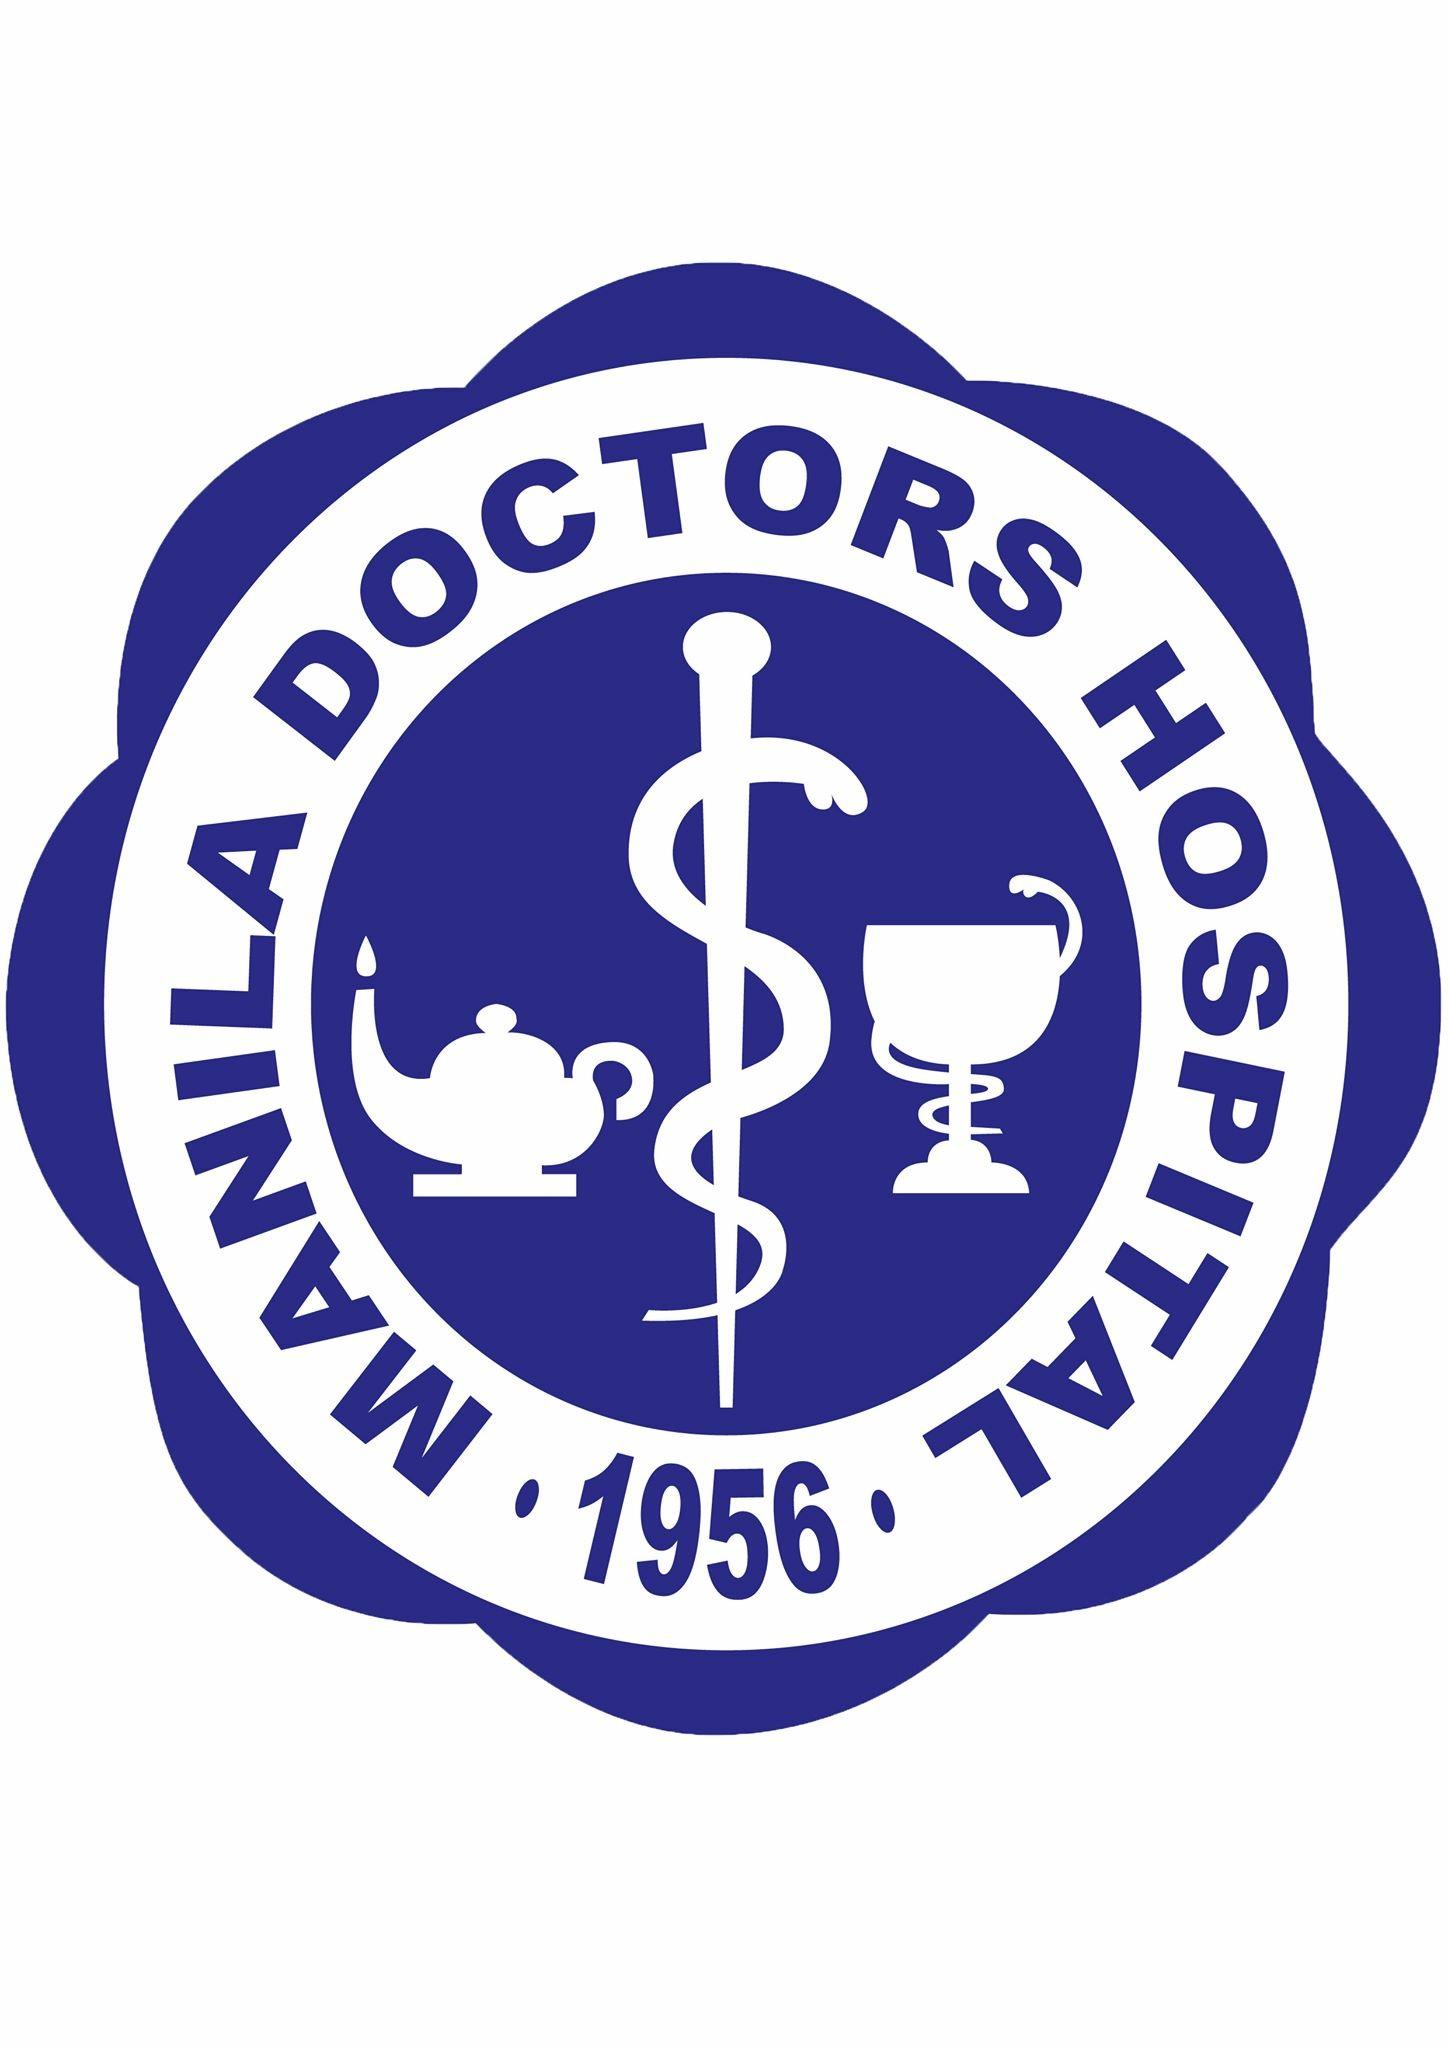 Manila Doctors Hospital - Room No. 210